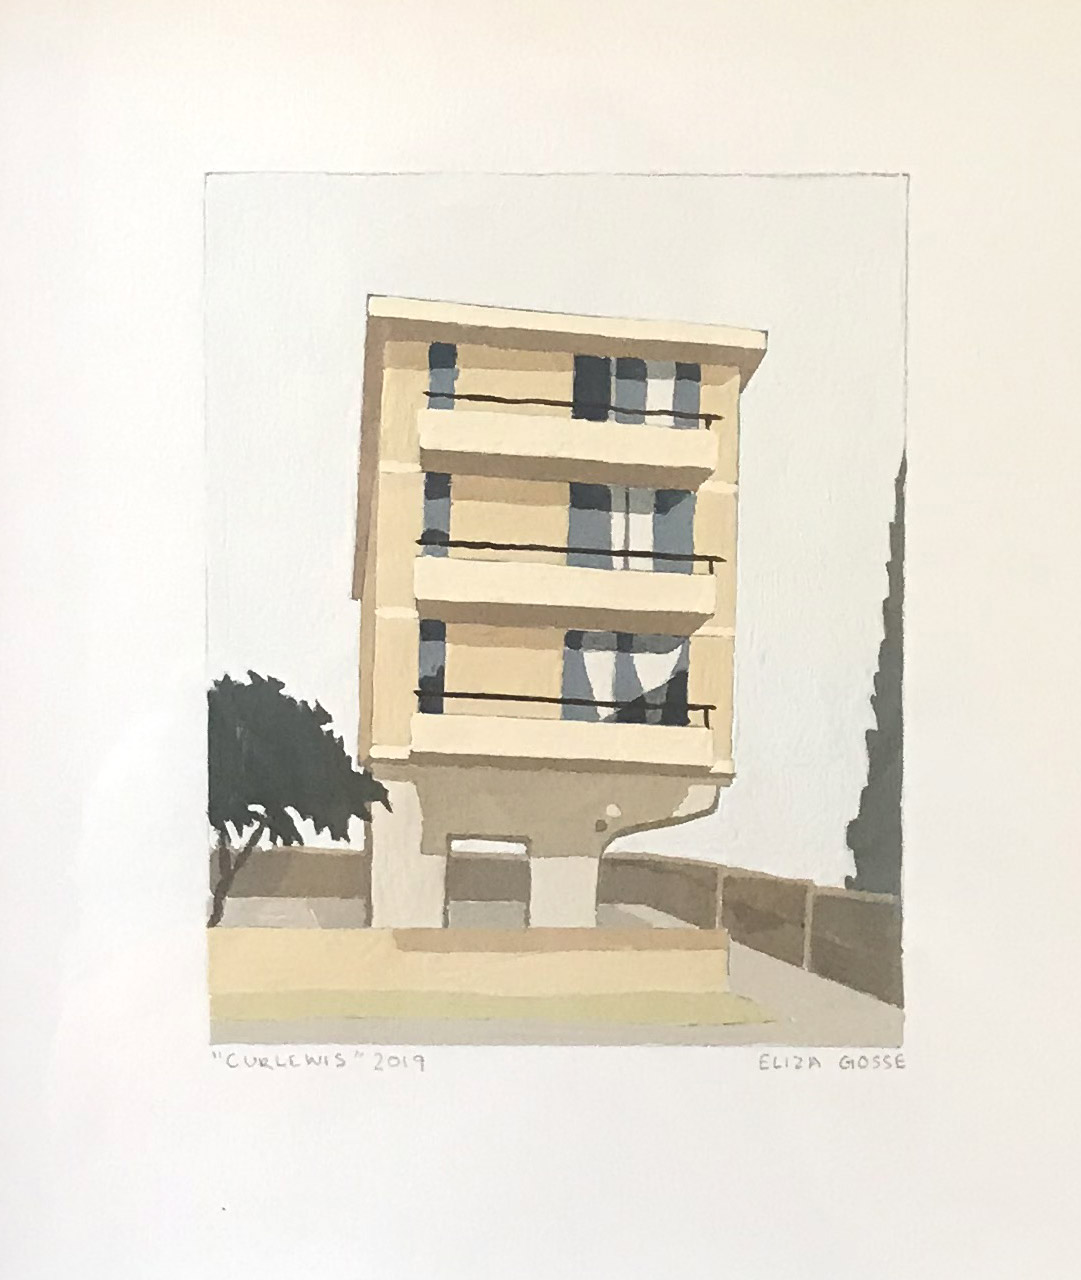 ELIZA GOSSE  Curlewis , 2019 gouache on paper 15 x 12 cm